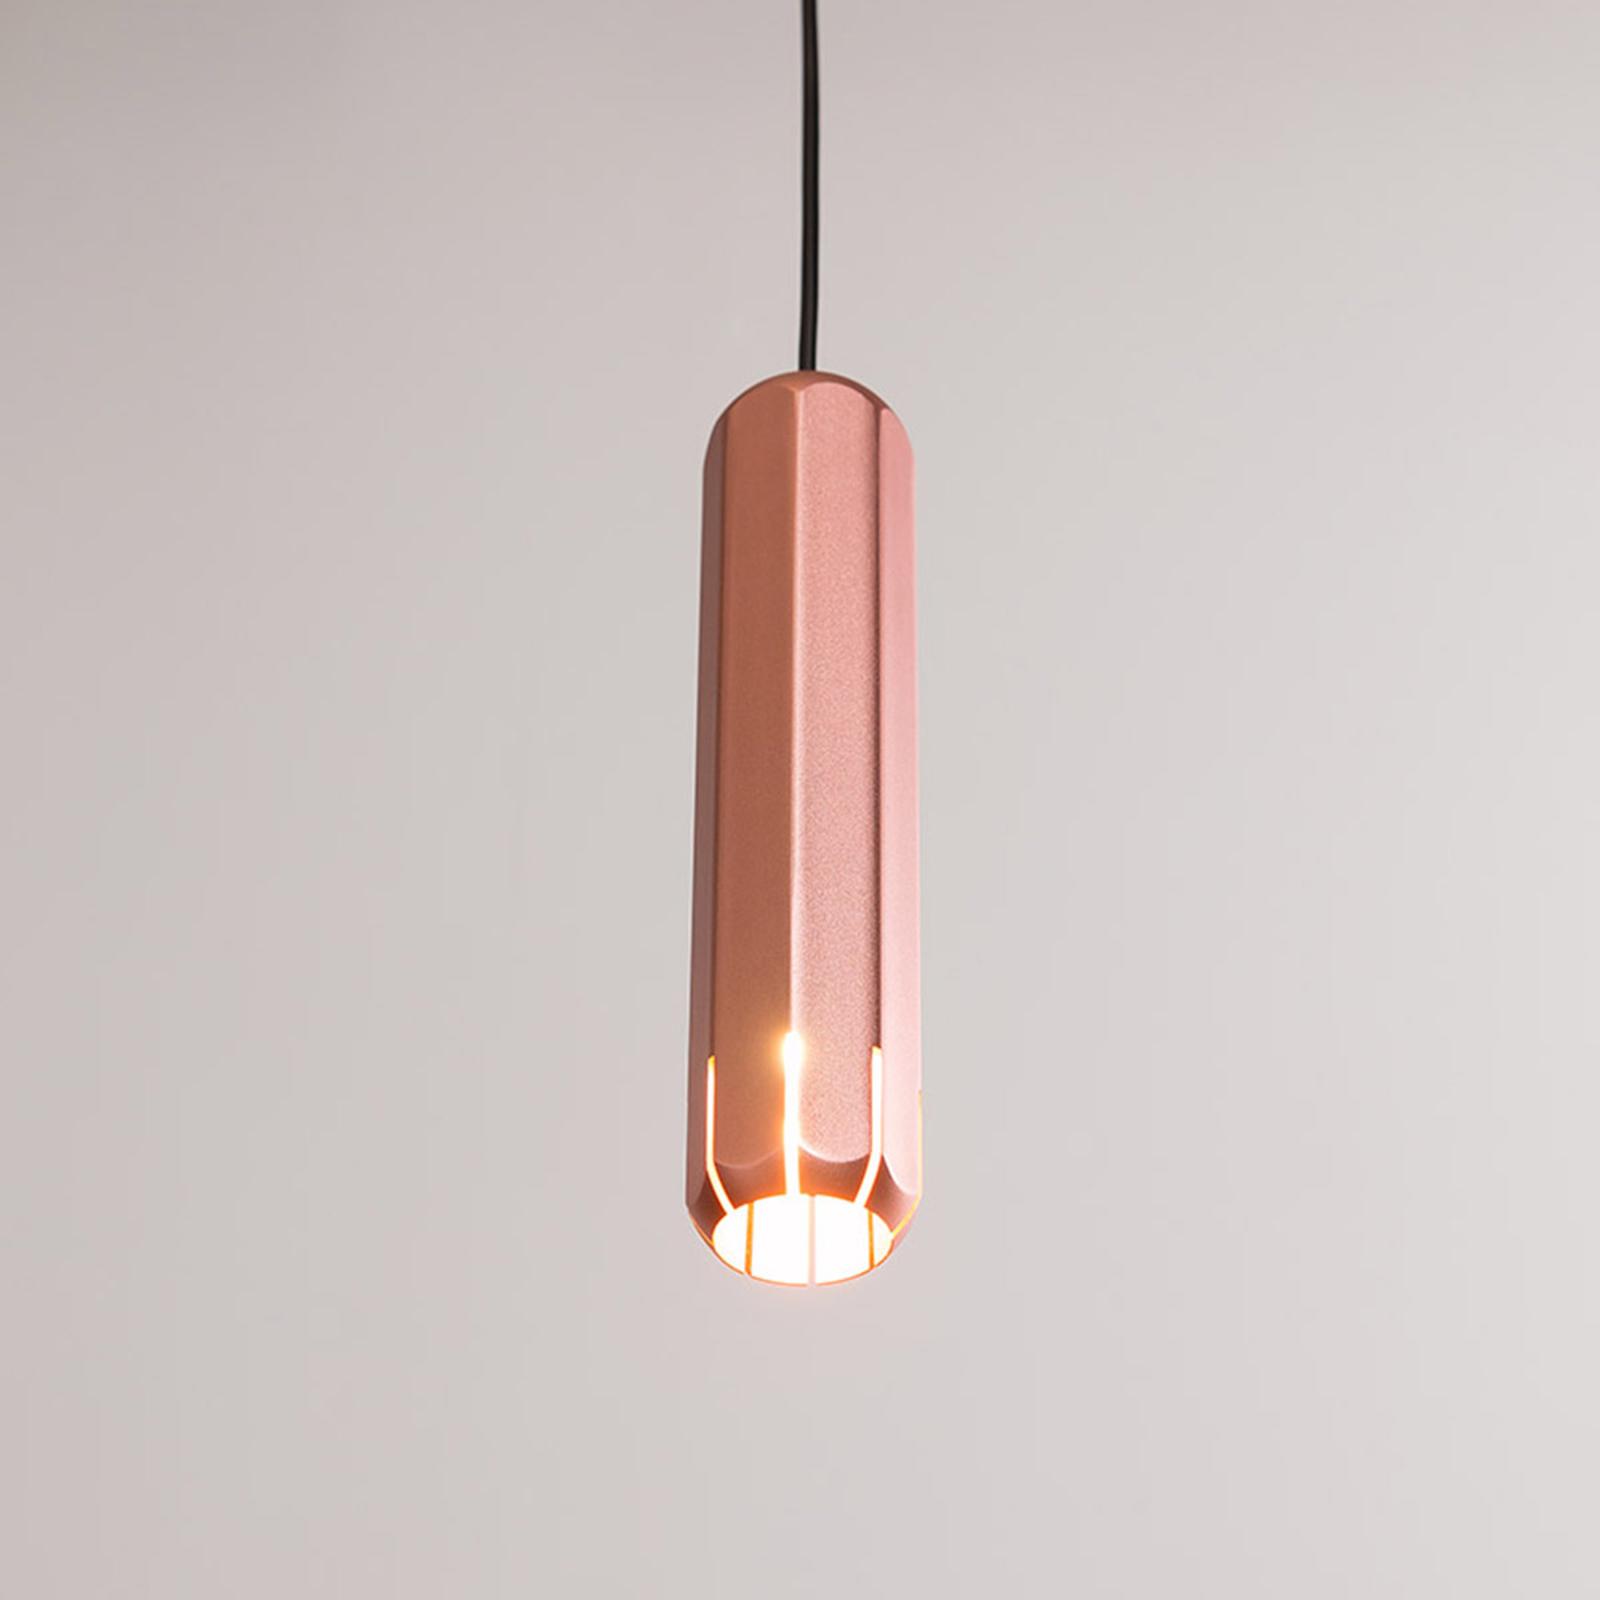 Innermost Brixton Spot 20 lampa wisząca LED miedź